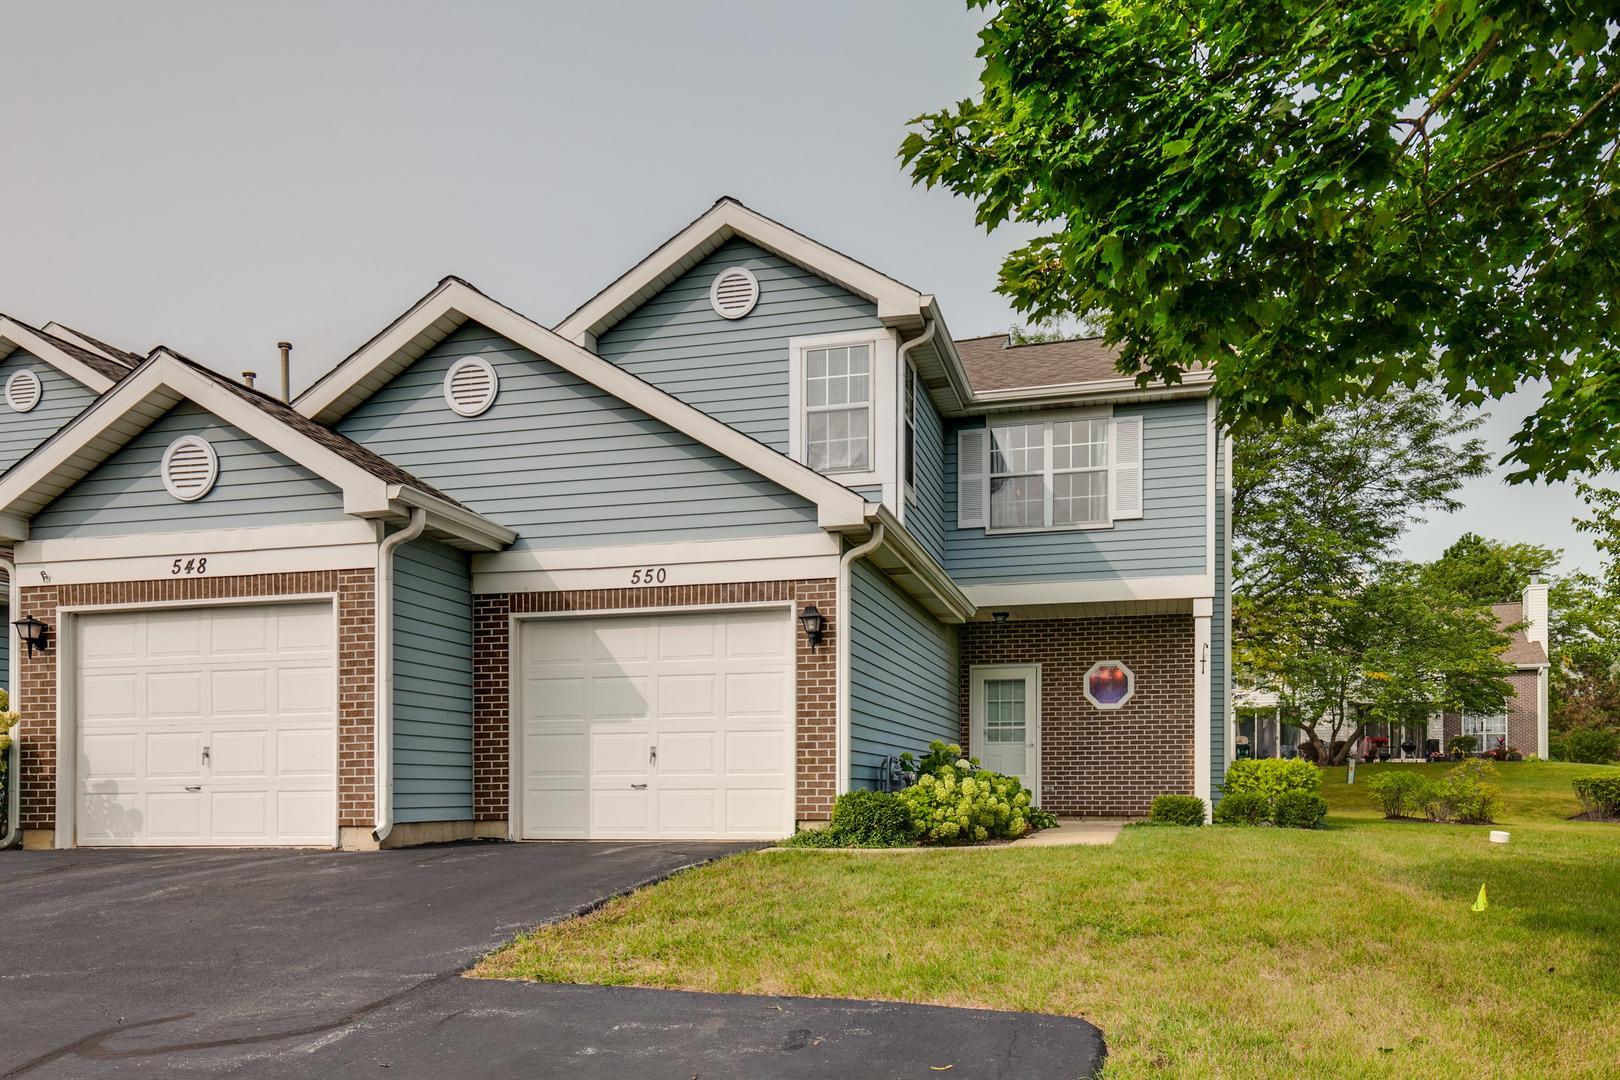 550 Woodhaven Drive, Unit 550, Mundelein, Il 60060